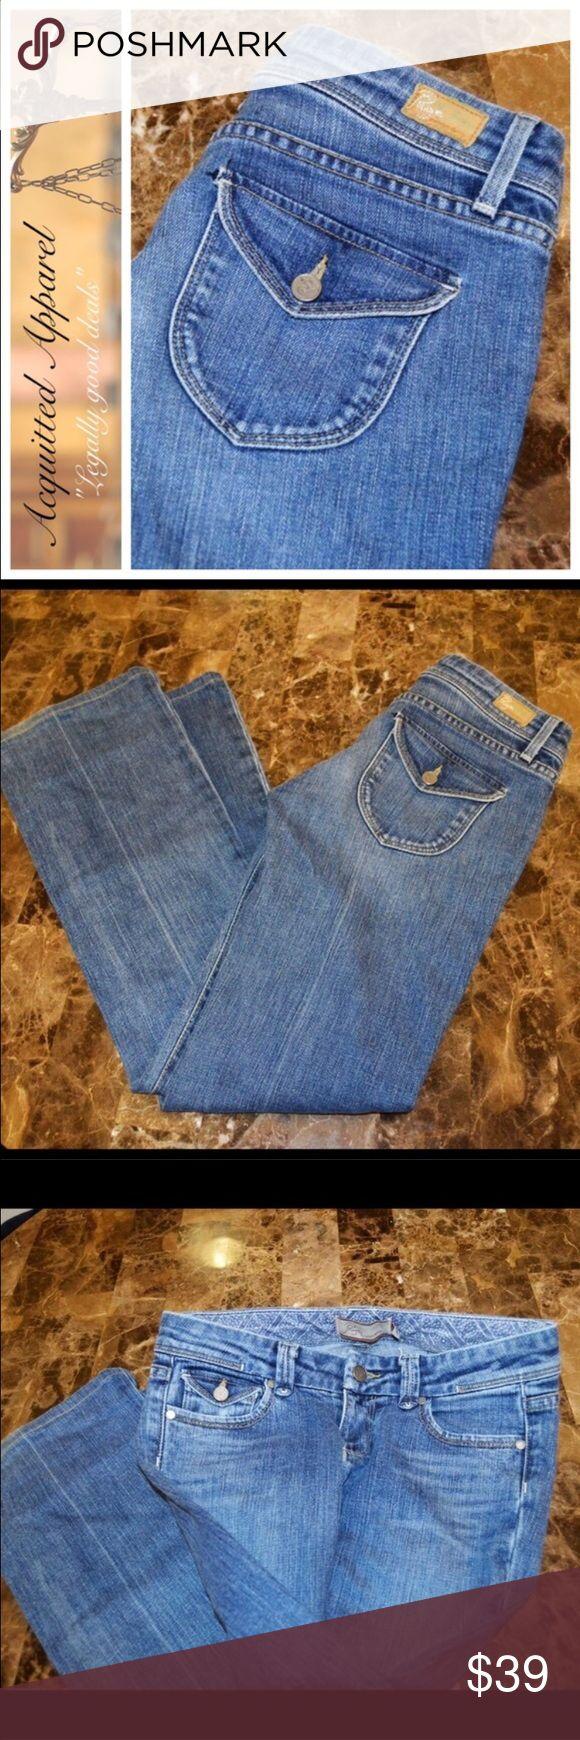 "Paige Jeans Pico Low Bootcut 30.5"" inseam Paige Jeans Pico Bootcut 30.5"" inseam 98% cotton 2% spandex. Excellent almost like new condition. Paige Jeans Jeans Boot Cut"